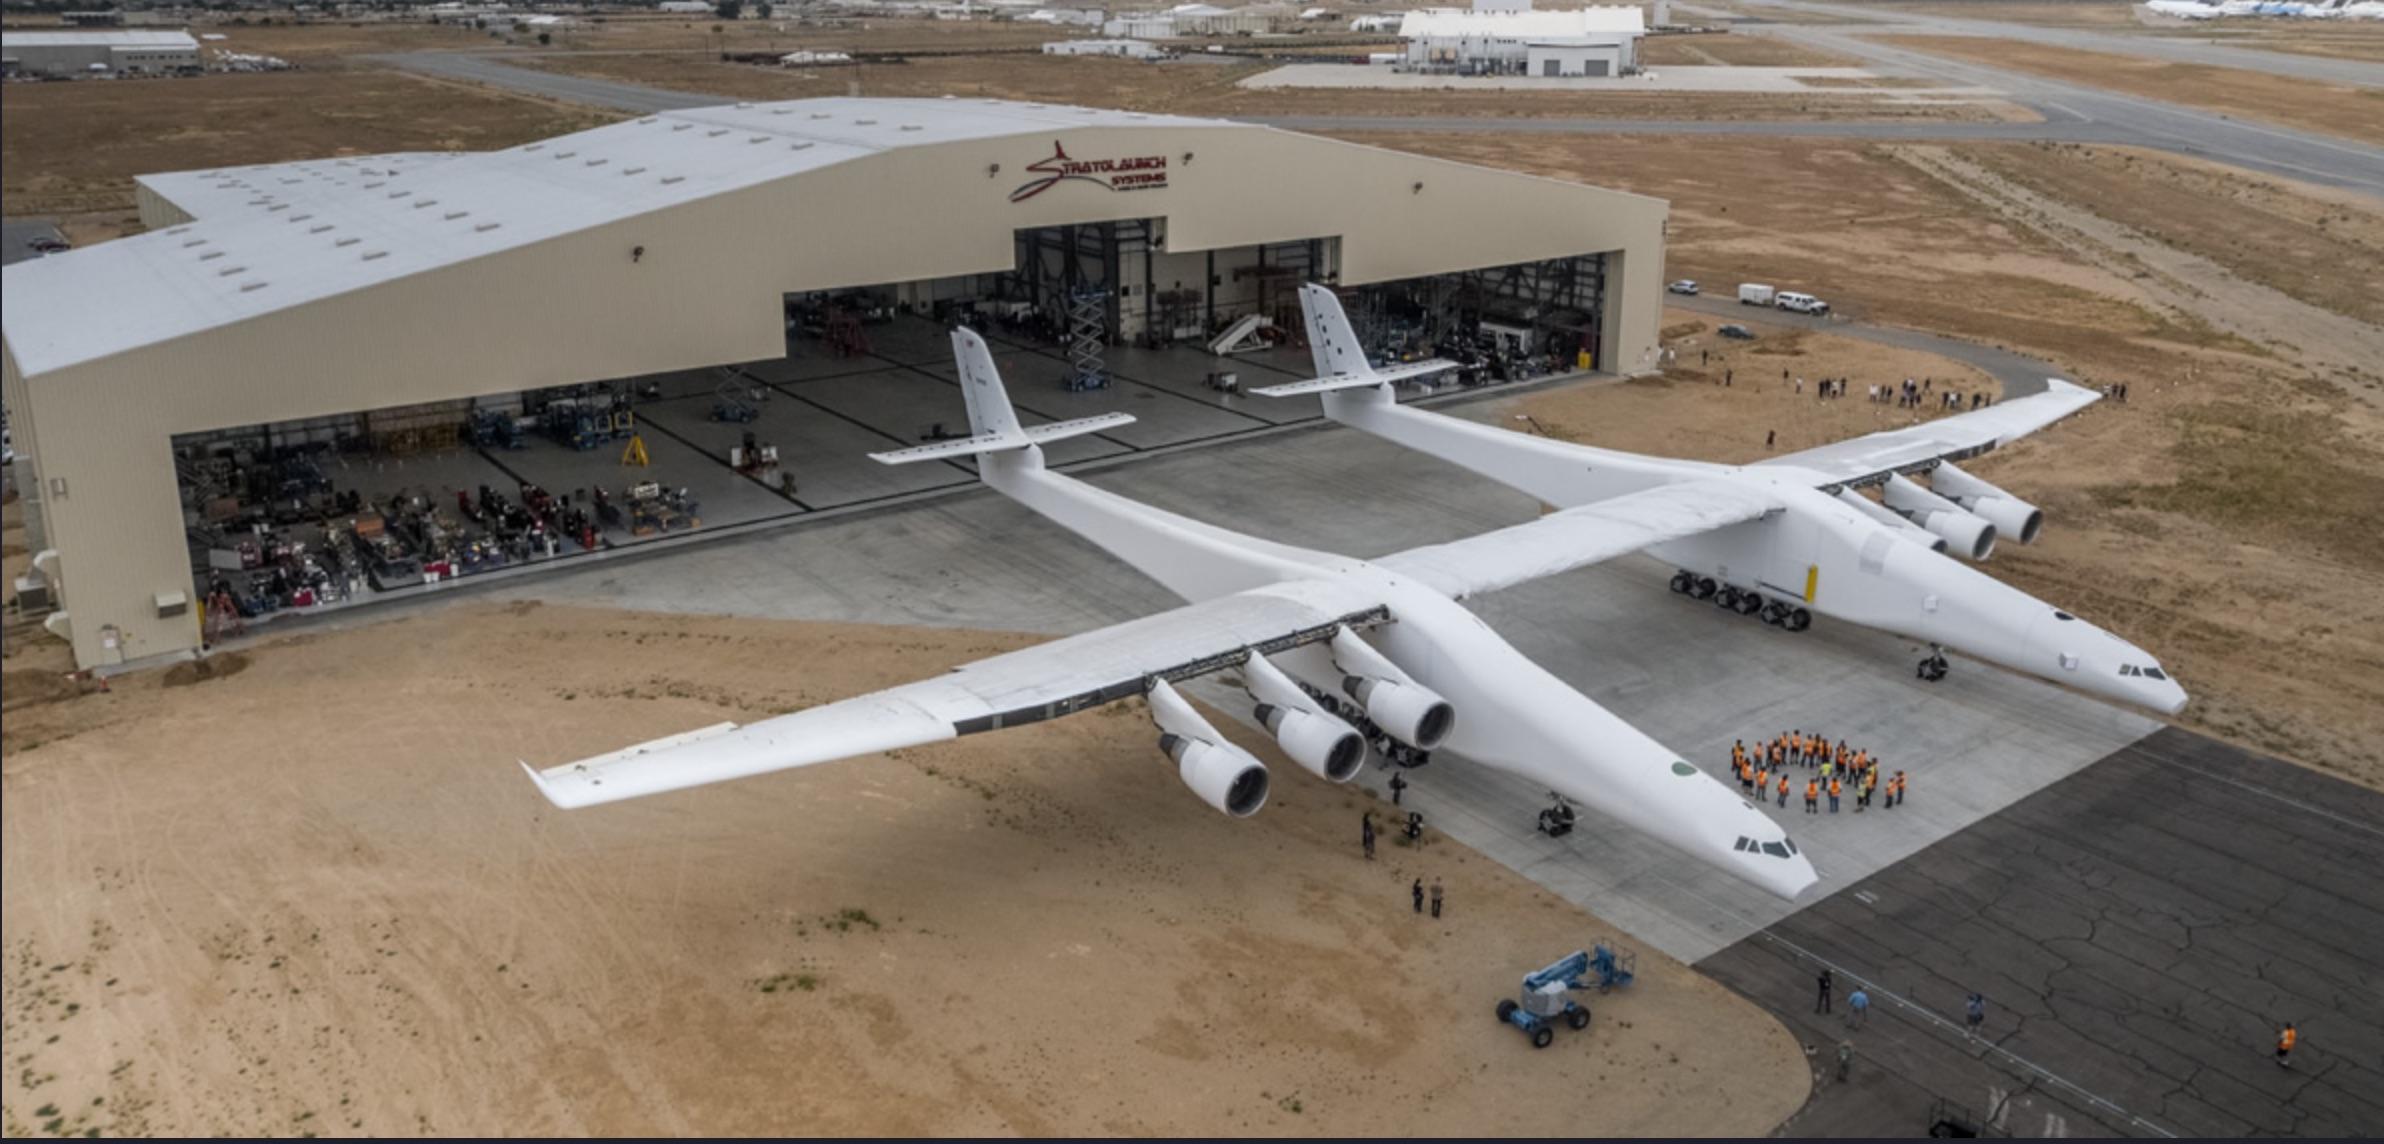 Paul Allen World's Largest Airplane